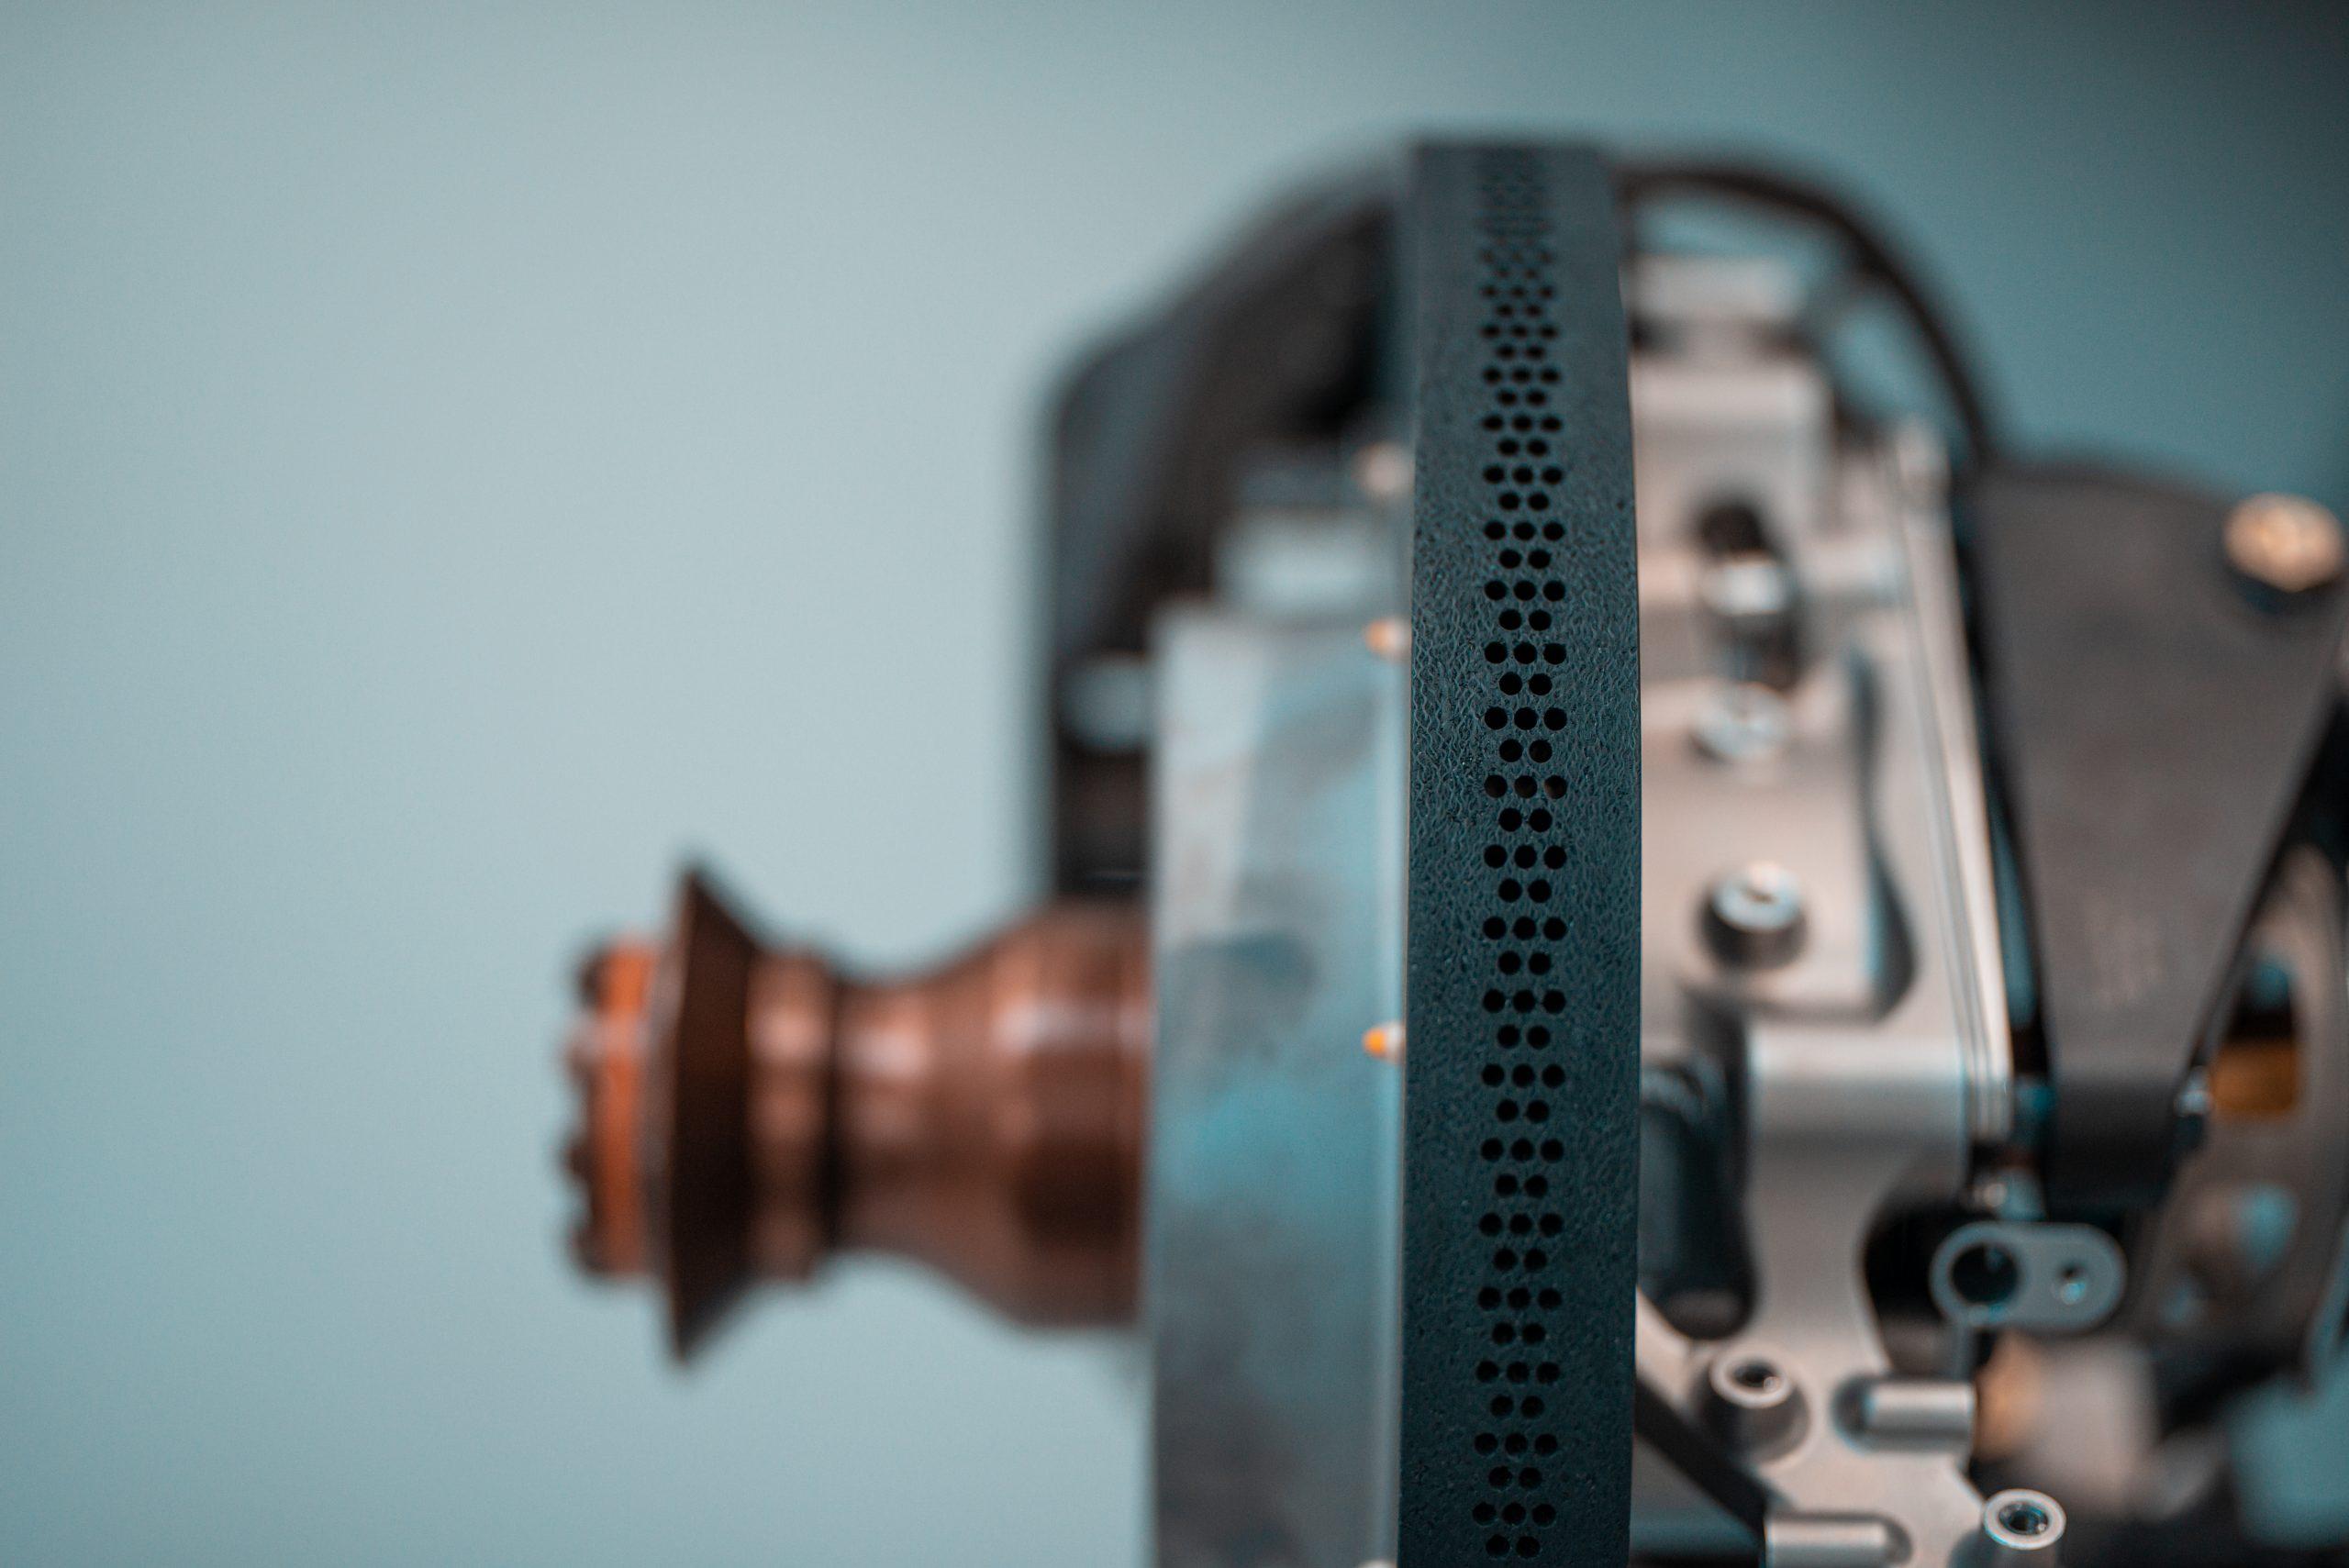 Glickenhaus 007 Hypercar LMH brake rotor detail